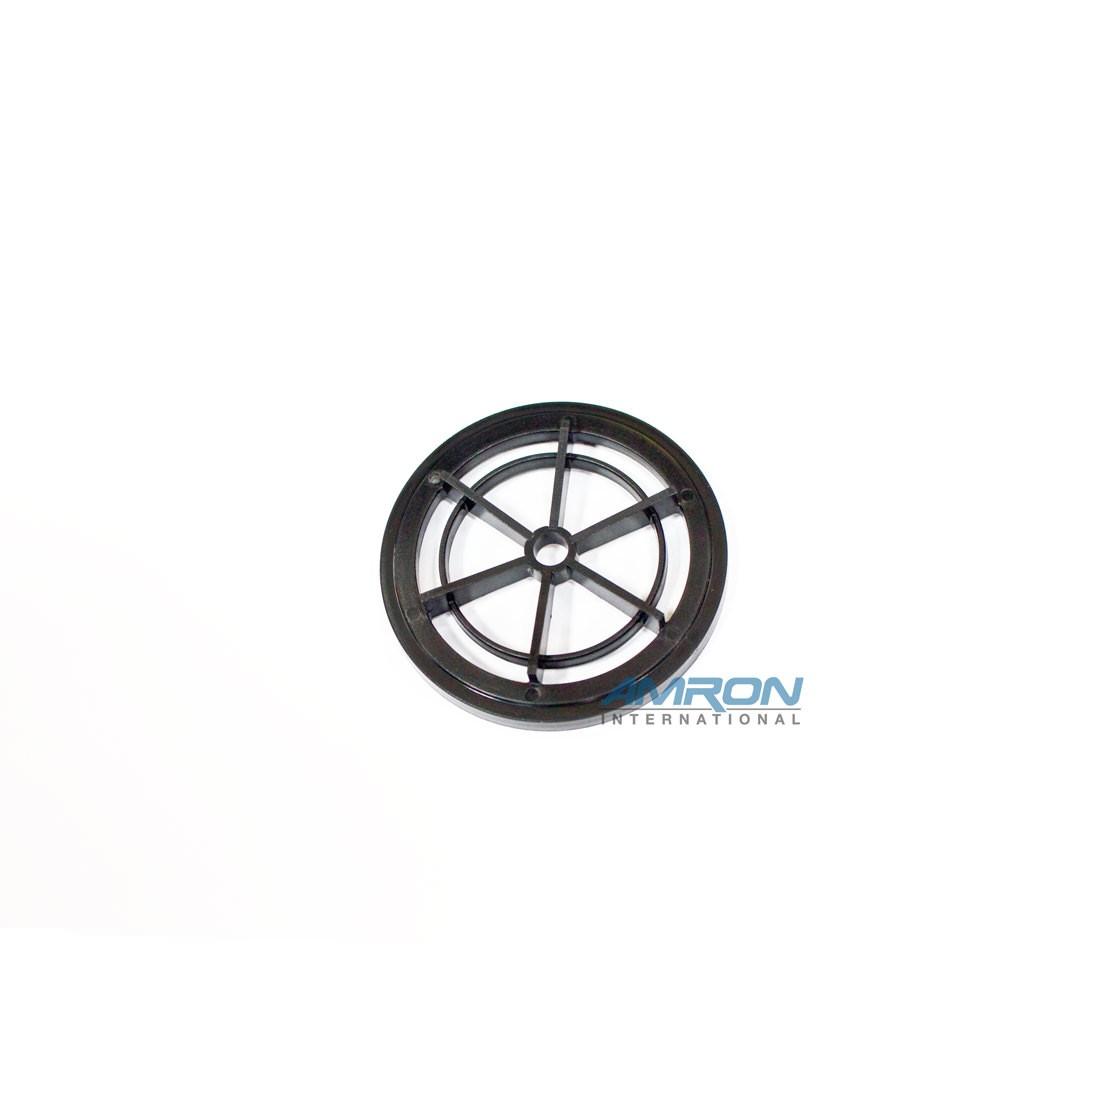 Kirby Morgan 520-022 Exhaust Valve Insert